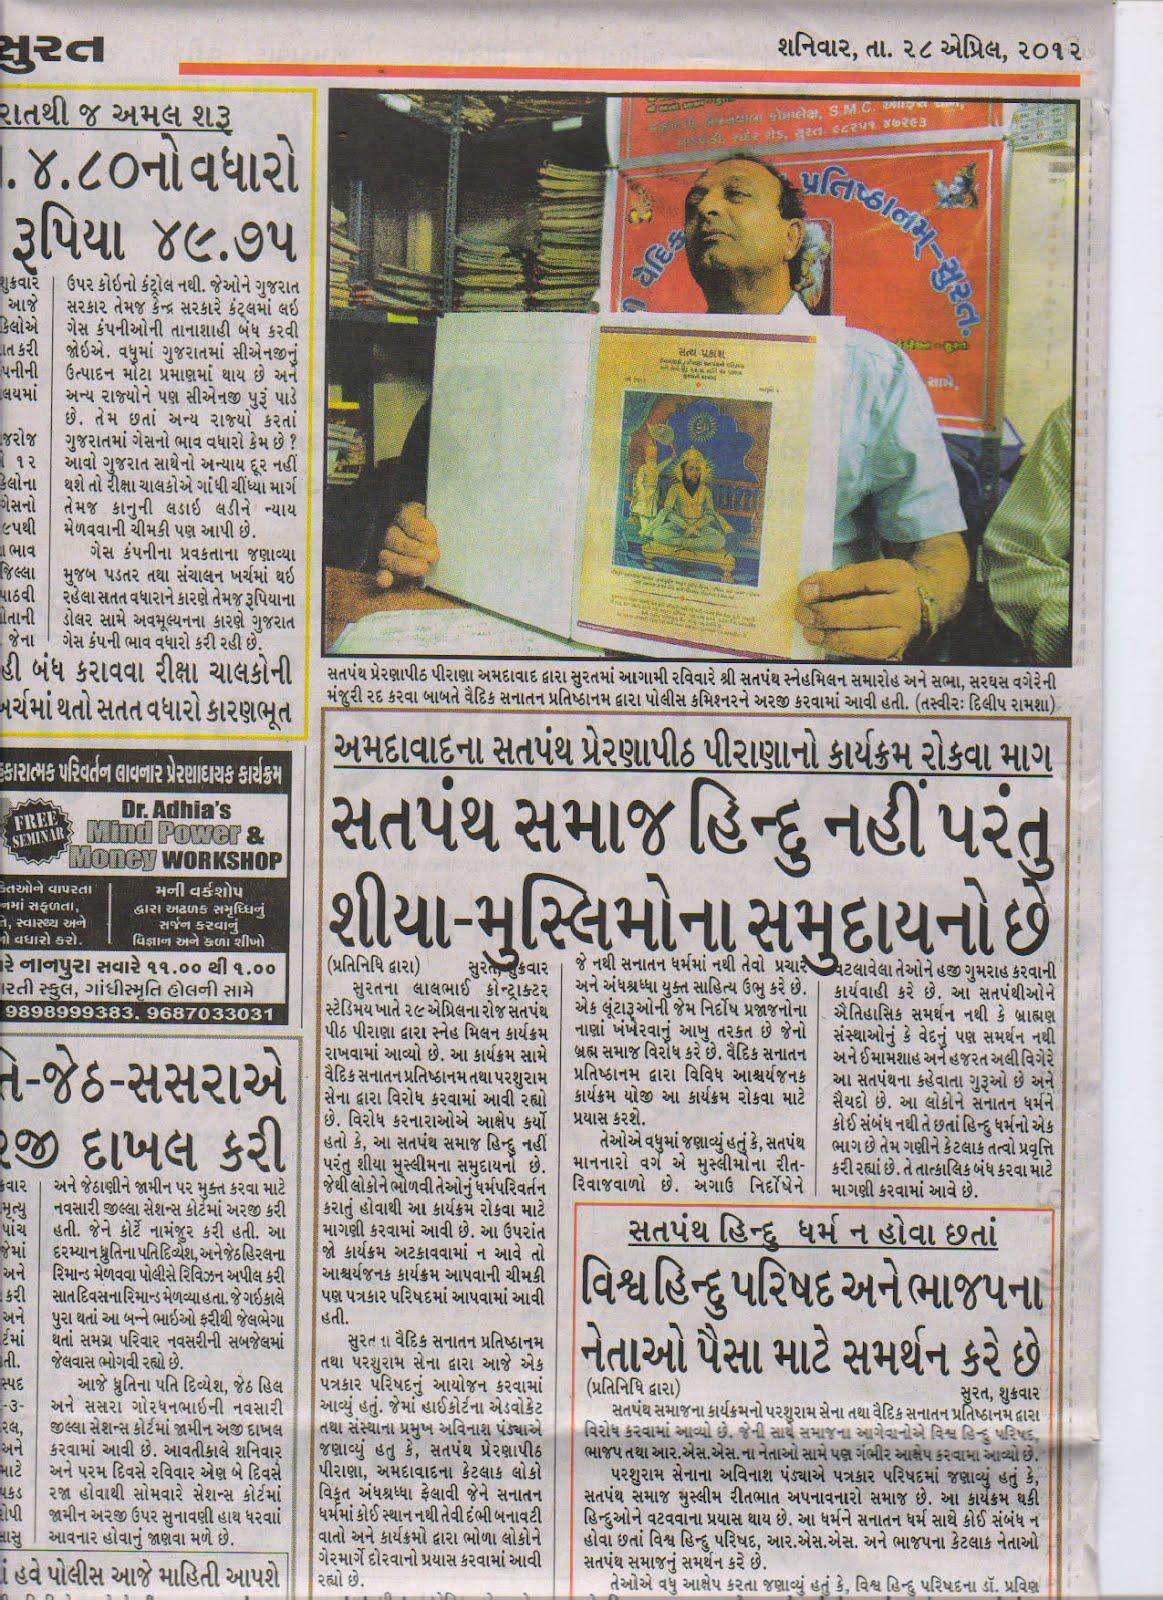 Sanatanpatidar Fwd Gujarat Samachar 28 04 2012 Surat General